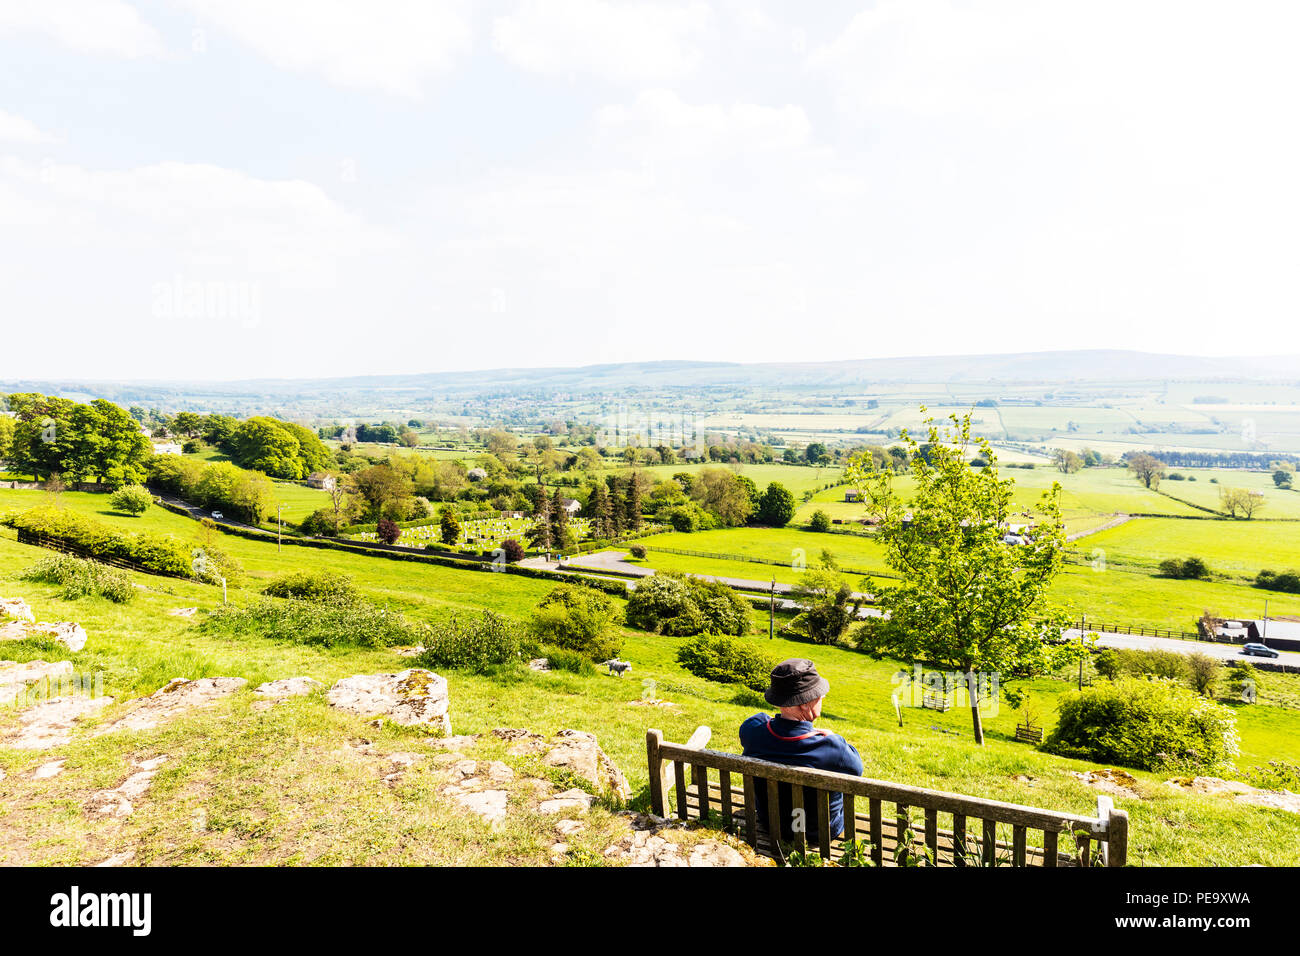 Loneliness, Man alone, man on bench, Man looking at Yorkshire Dales, man on Leyburn Shawl, Leyburn Shawl Yorkshire Dales UK, alone, loss, reminiscing, - Stock Image